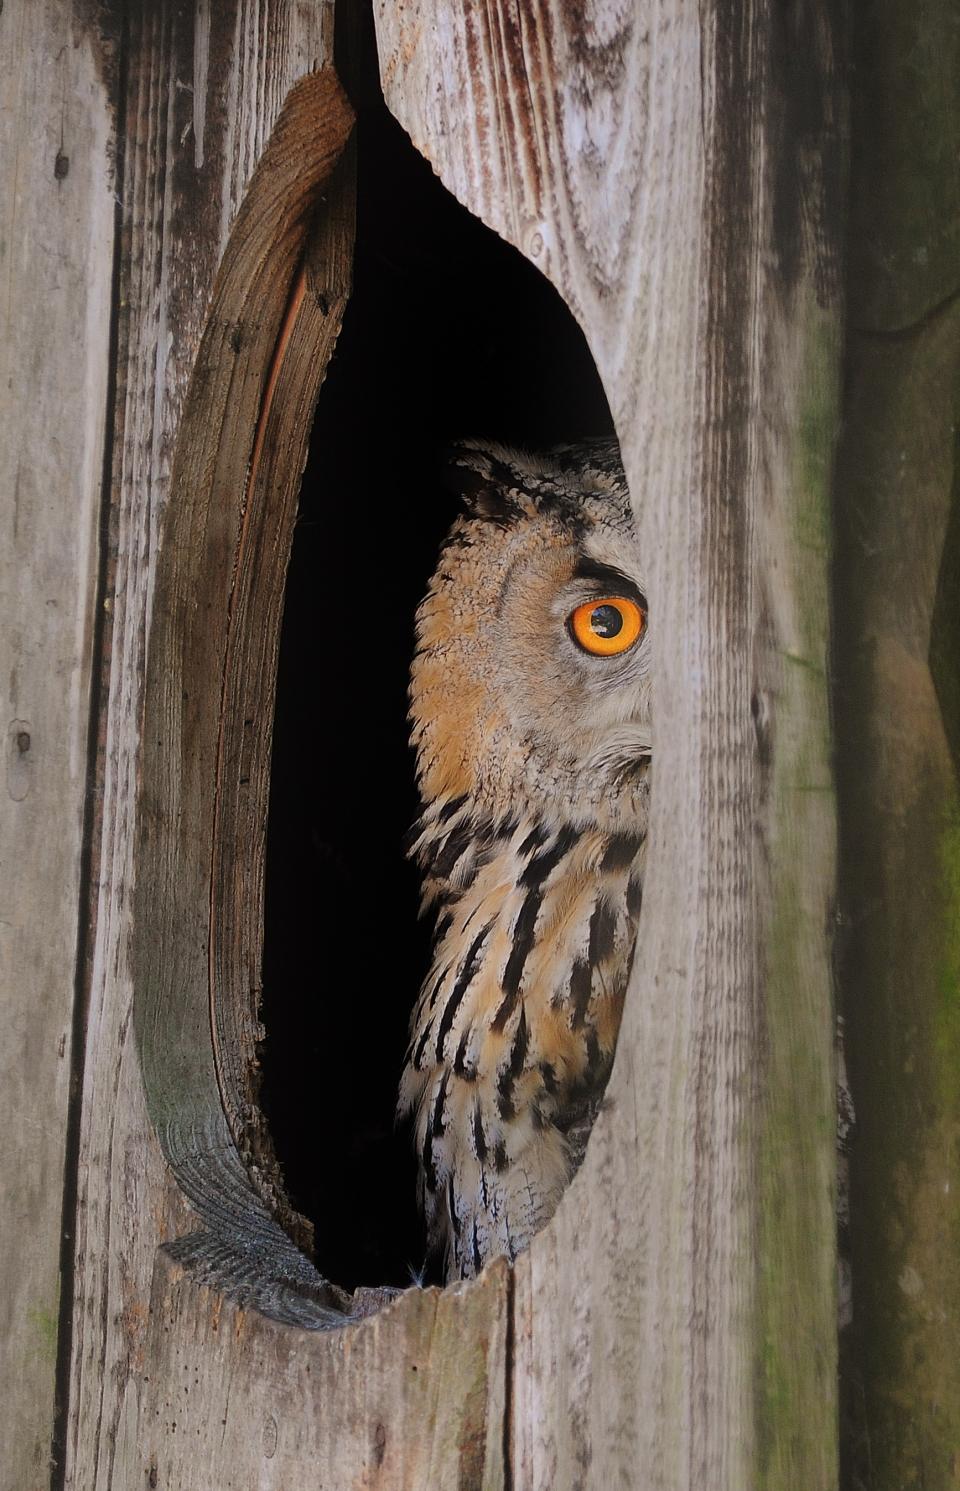 owl, bird, wood